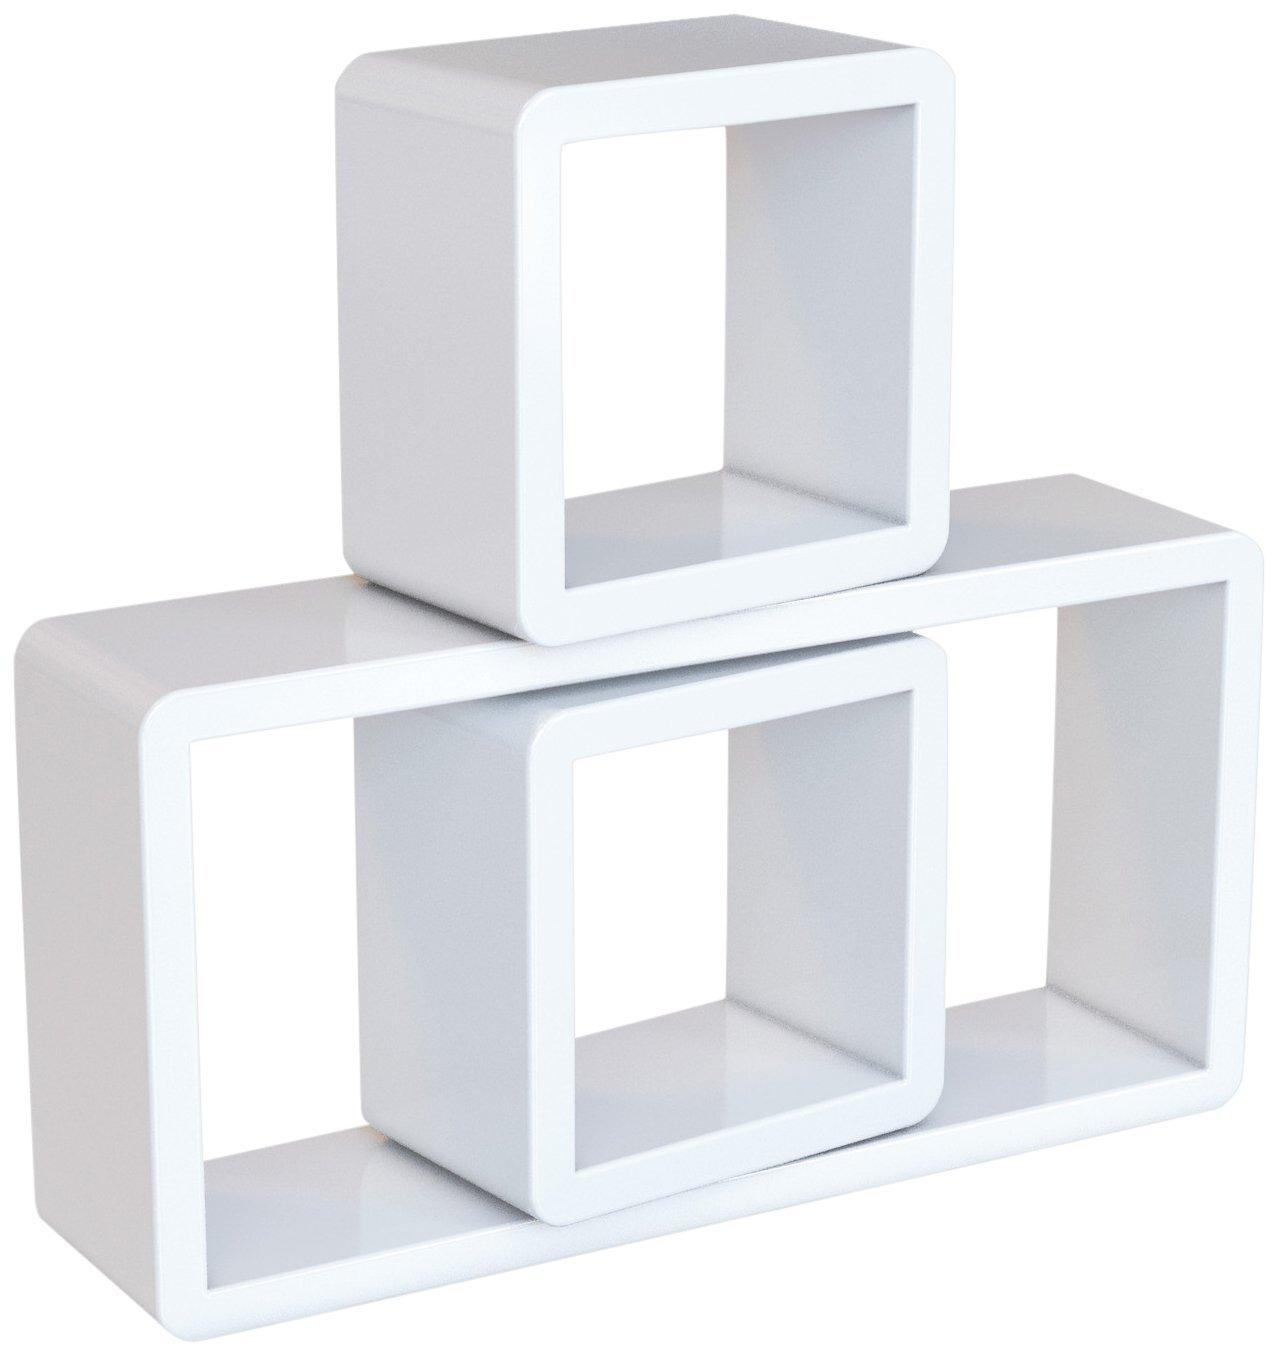 etagere ikea cuisine. Black Bedroom Furniture Sets. Home Design Ideas